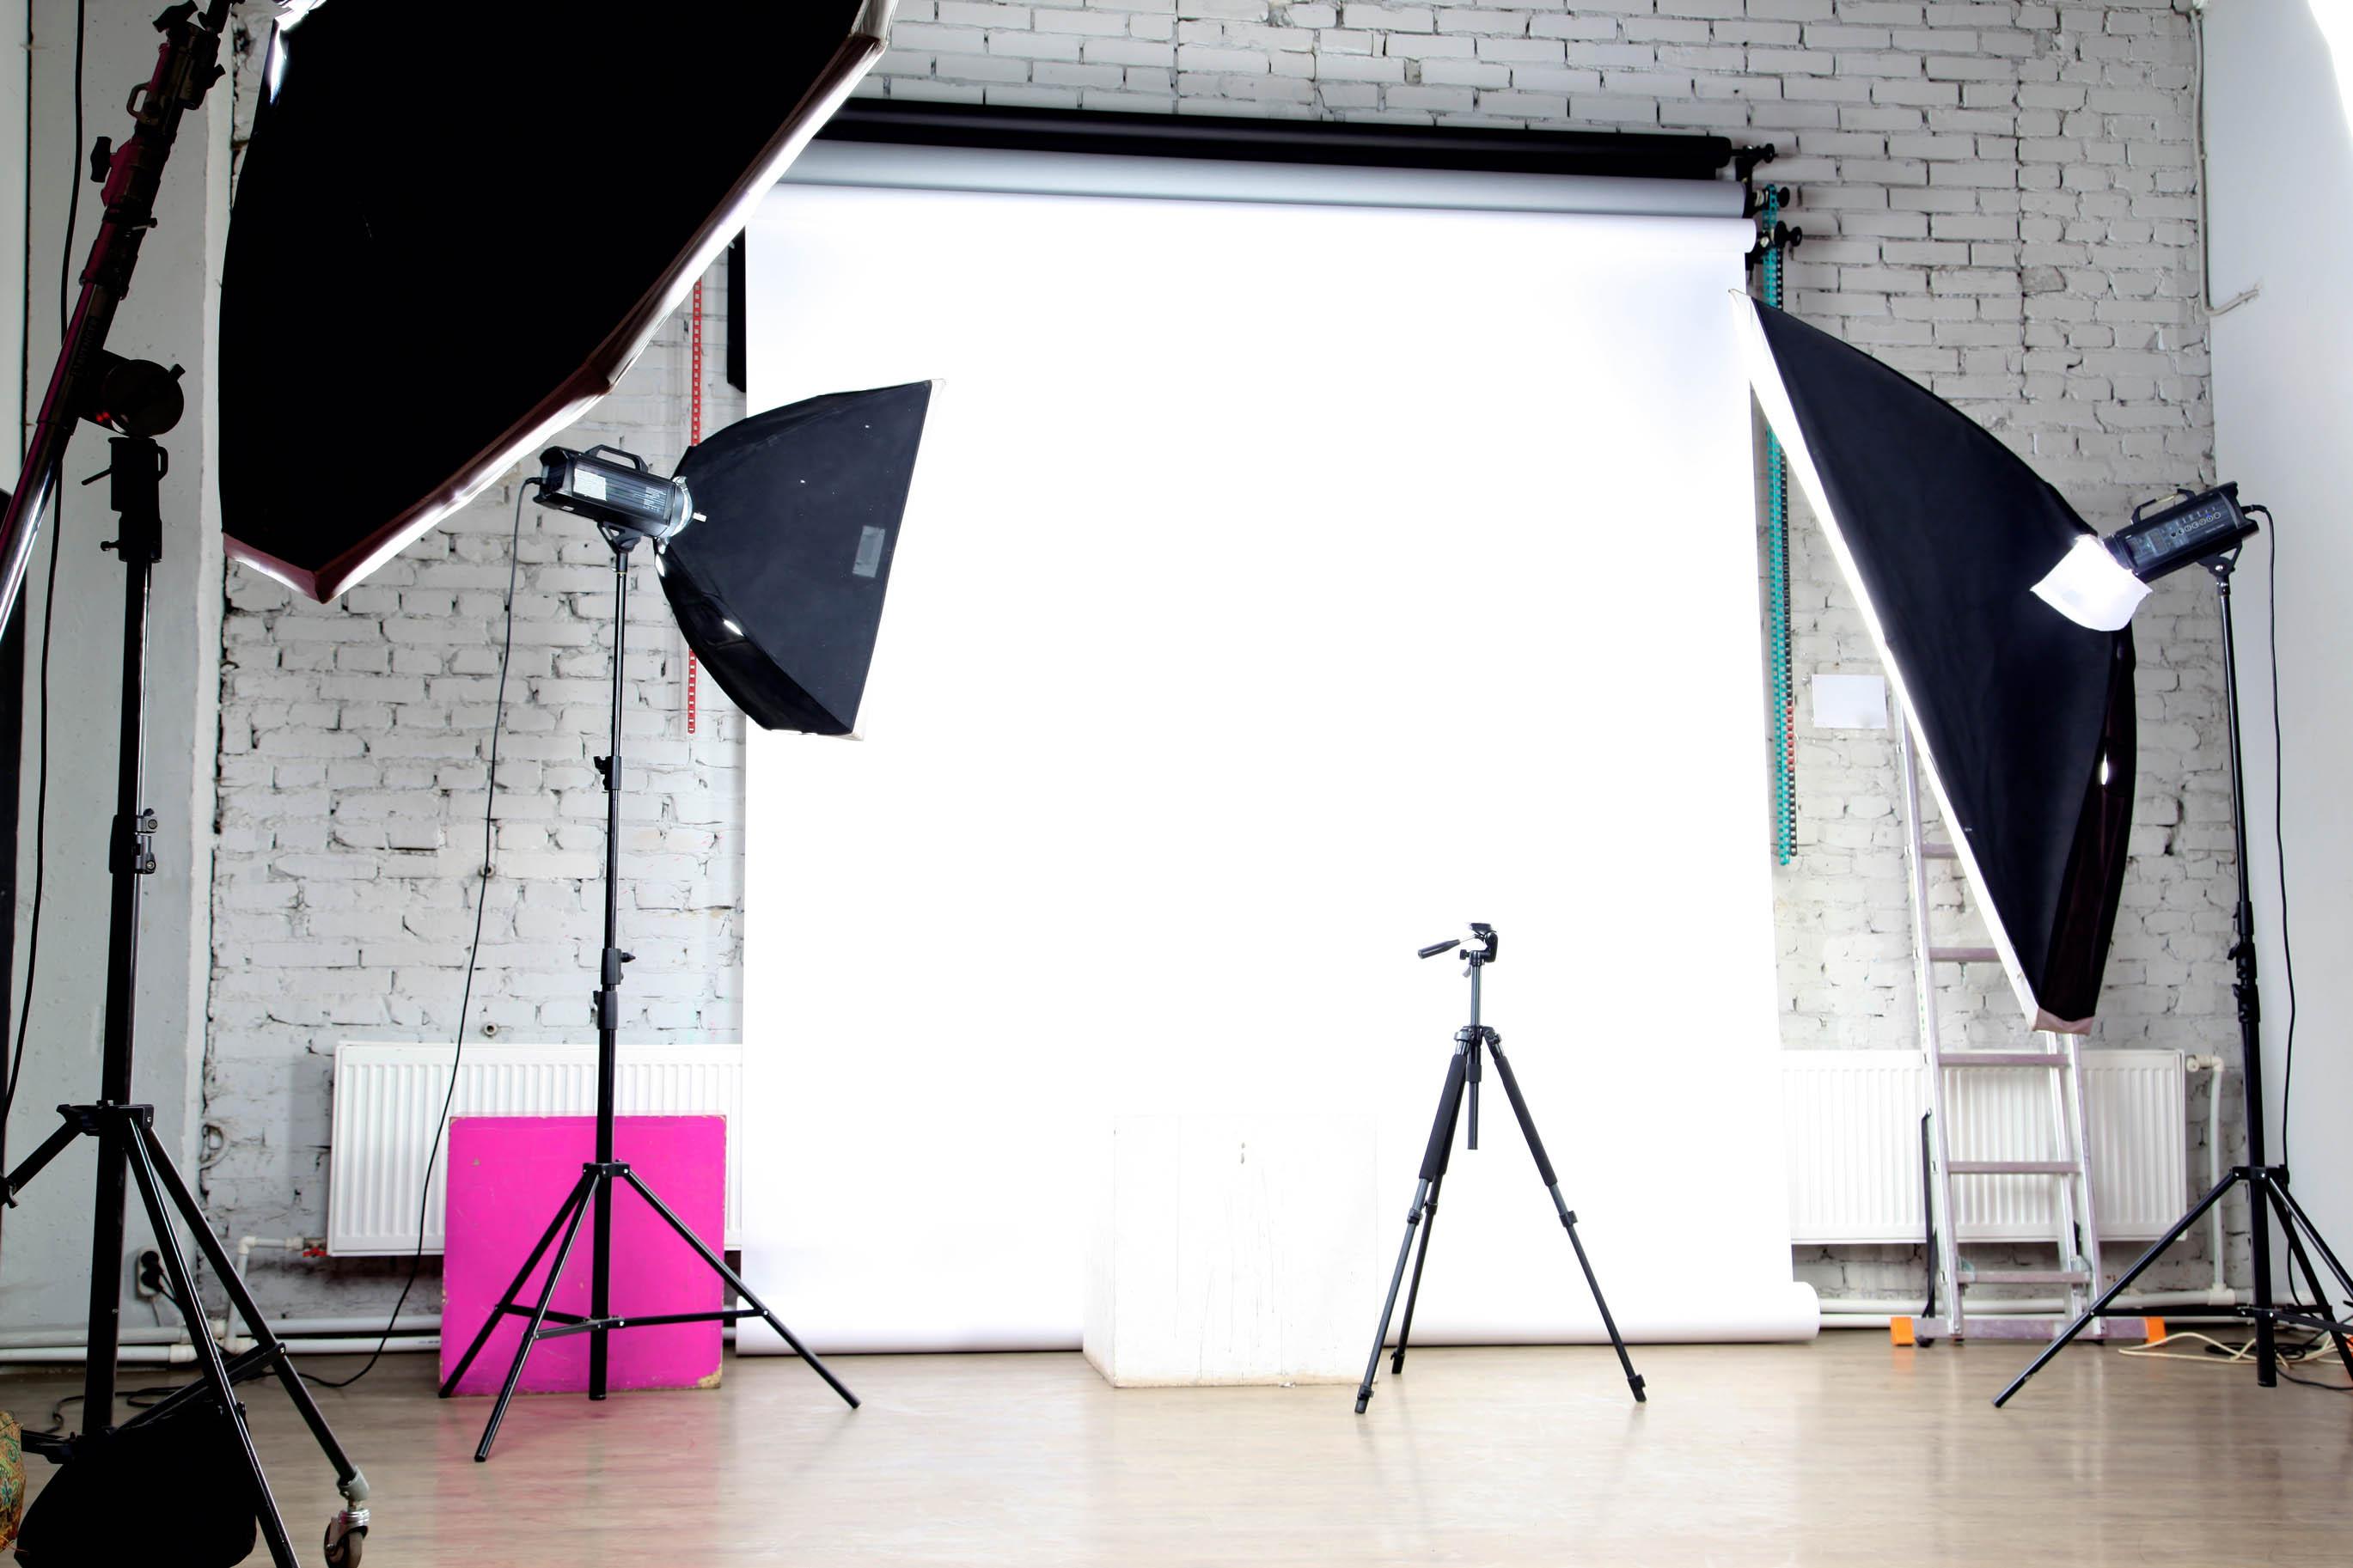 Professional Photography Studio Photo studio 2: galleryhip.com/professional-photography-studio.html